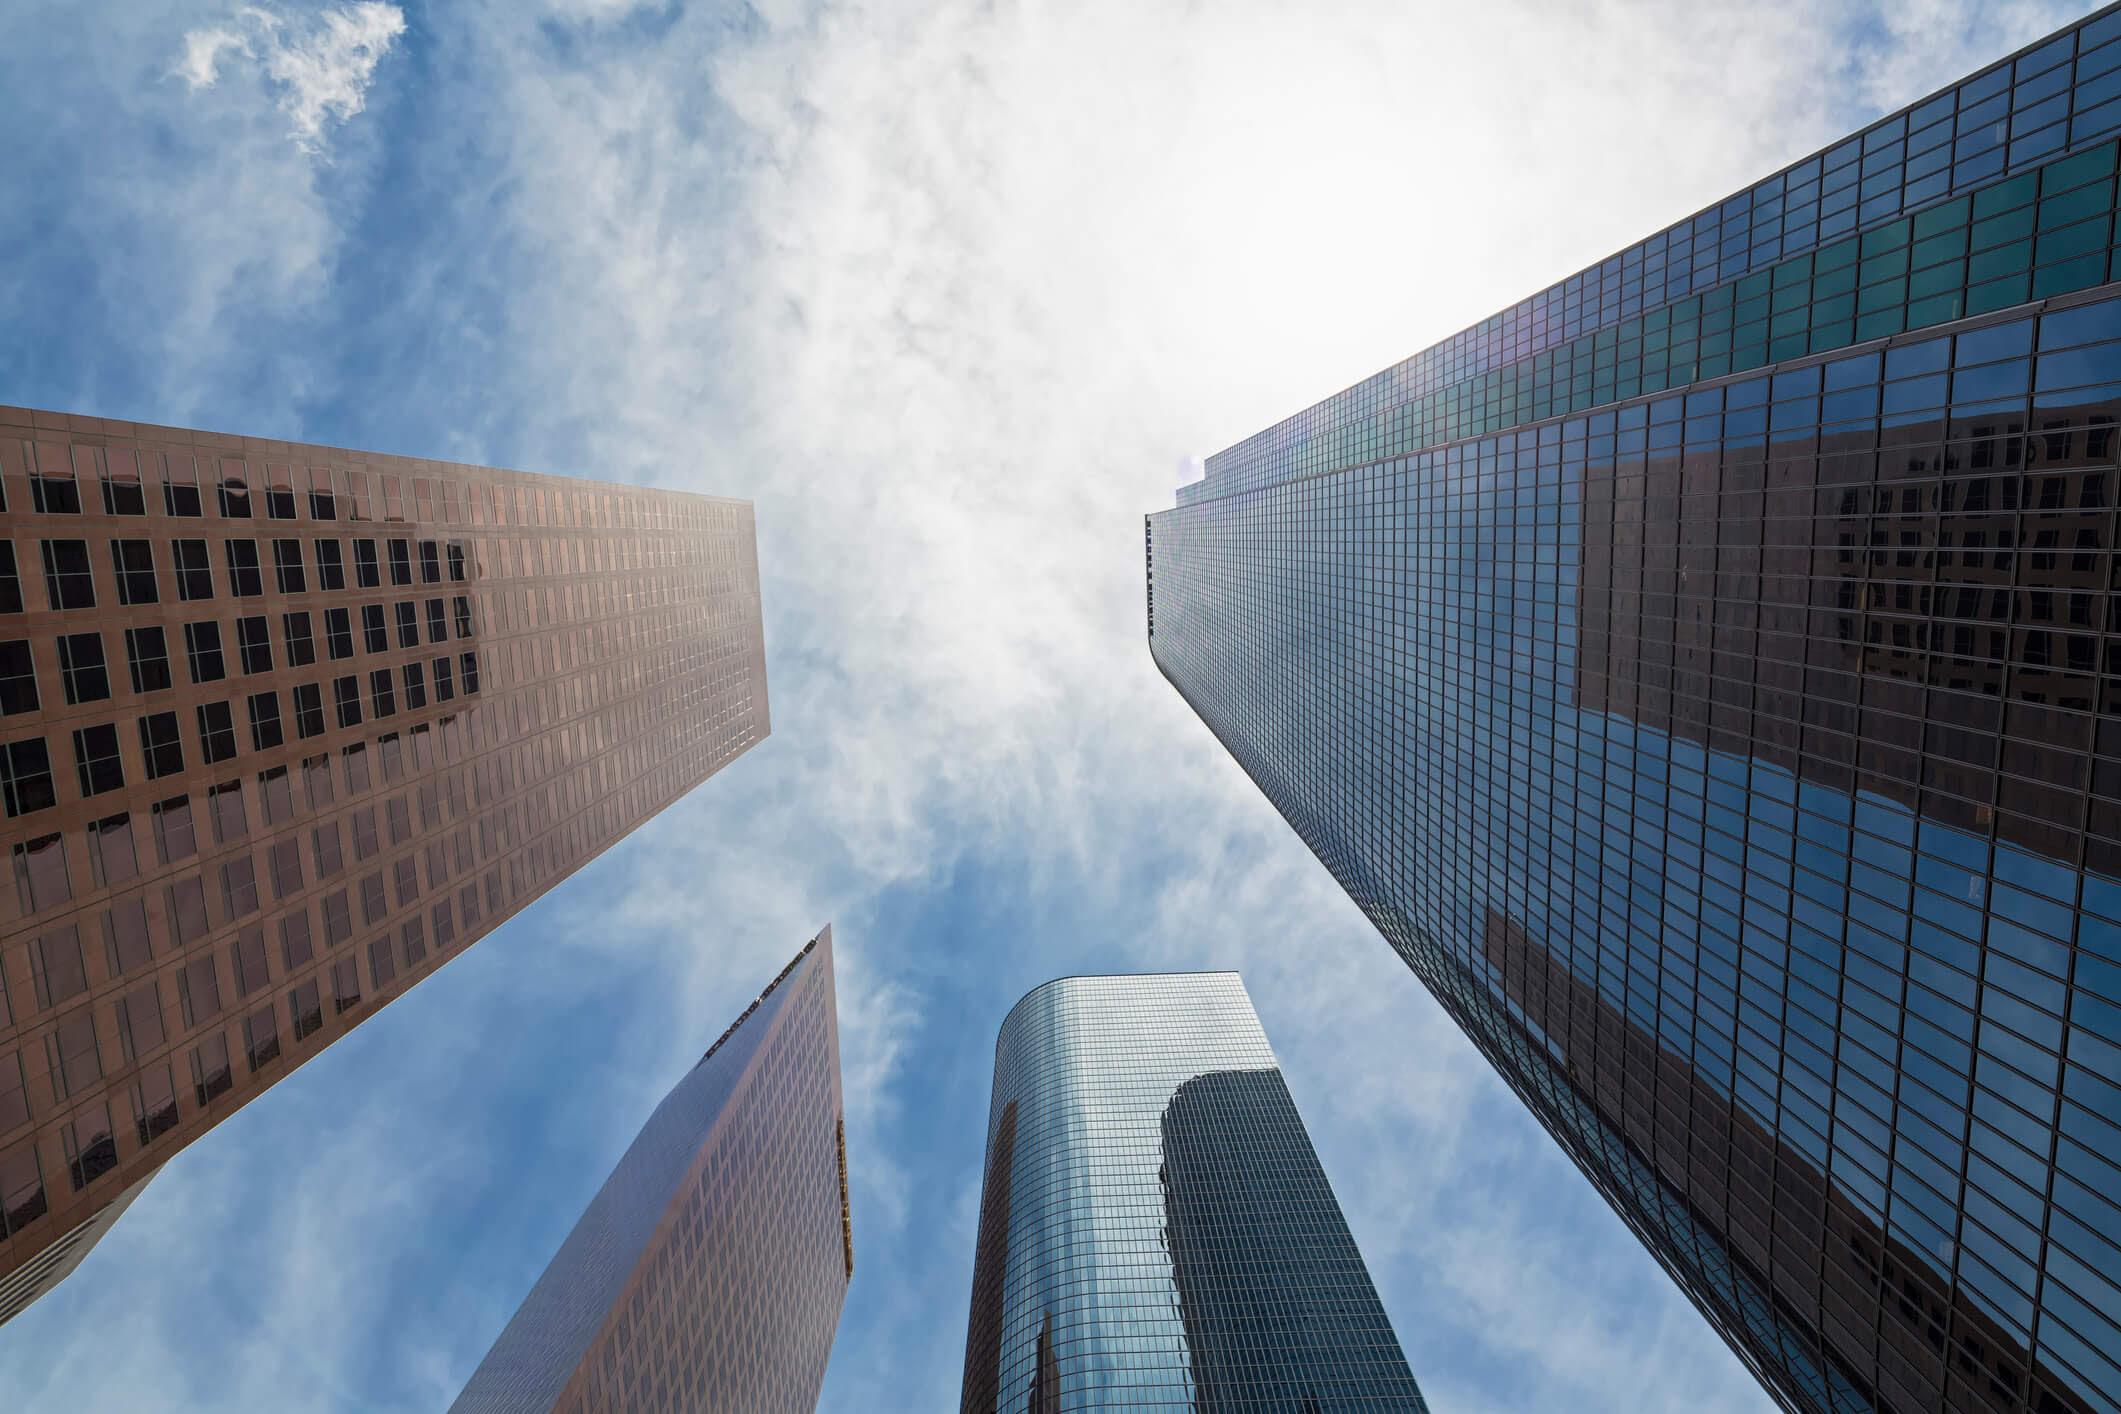 Skyscrapers in Charlotte